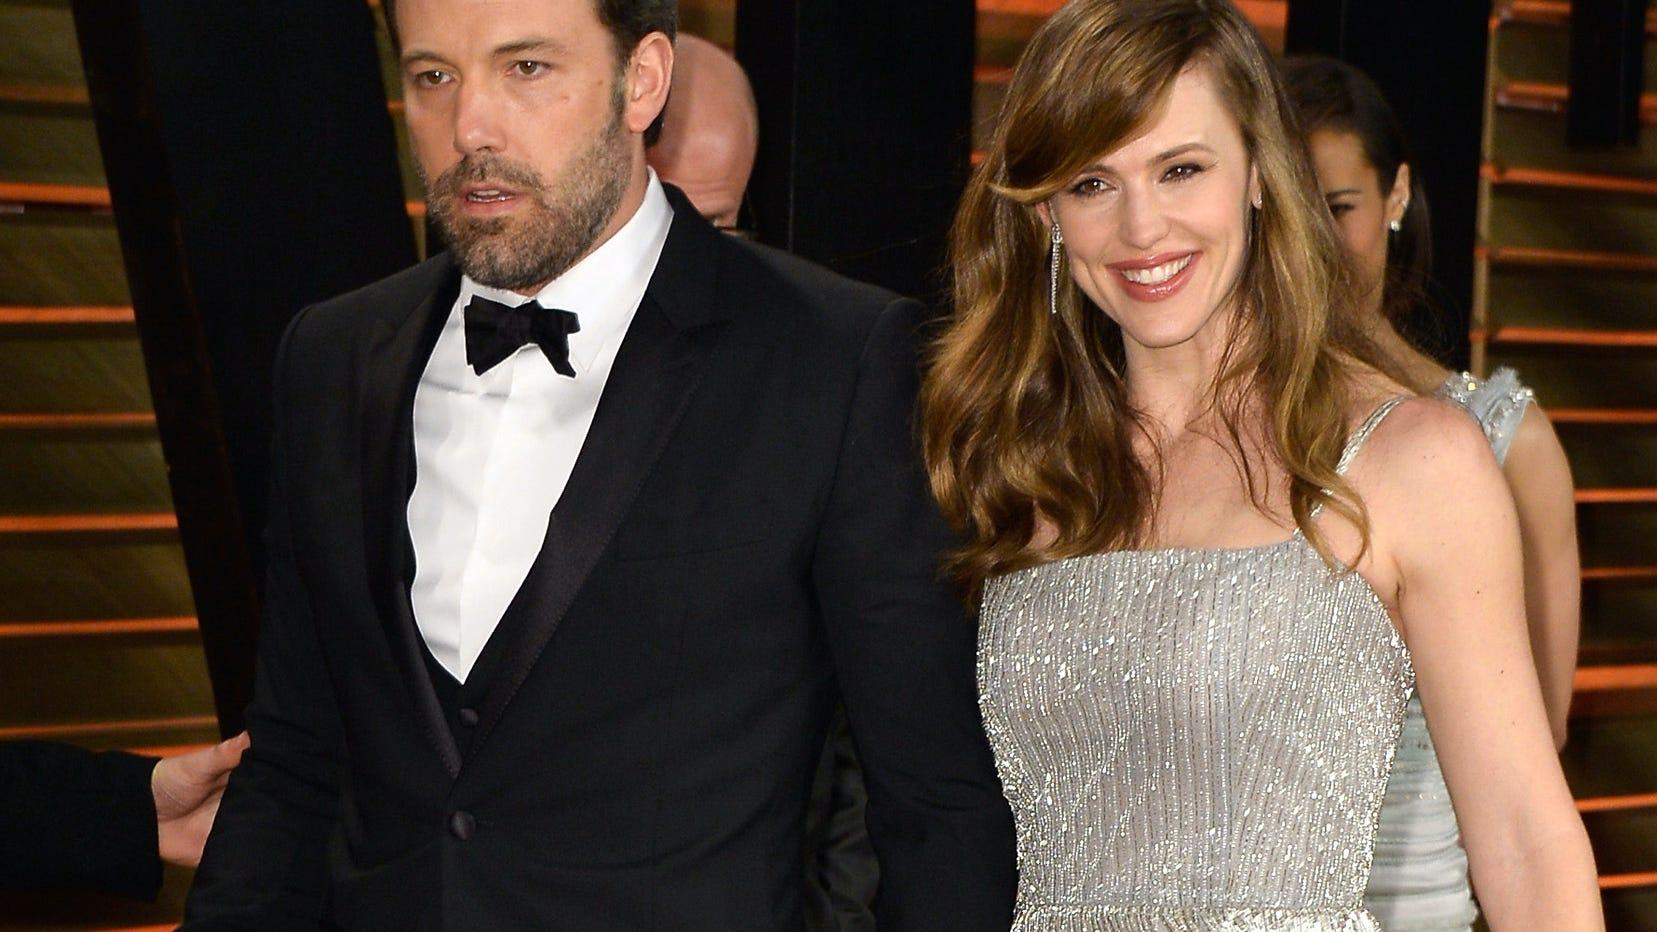 Jennifer Garner reveals the touching reason she plans to dance with ex-husband Ben Affleck again